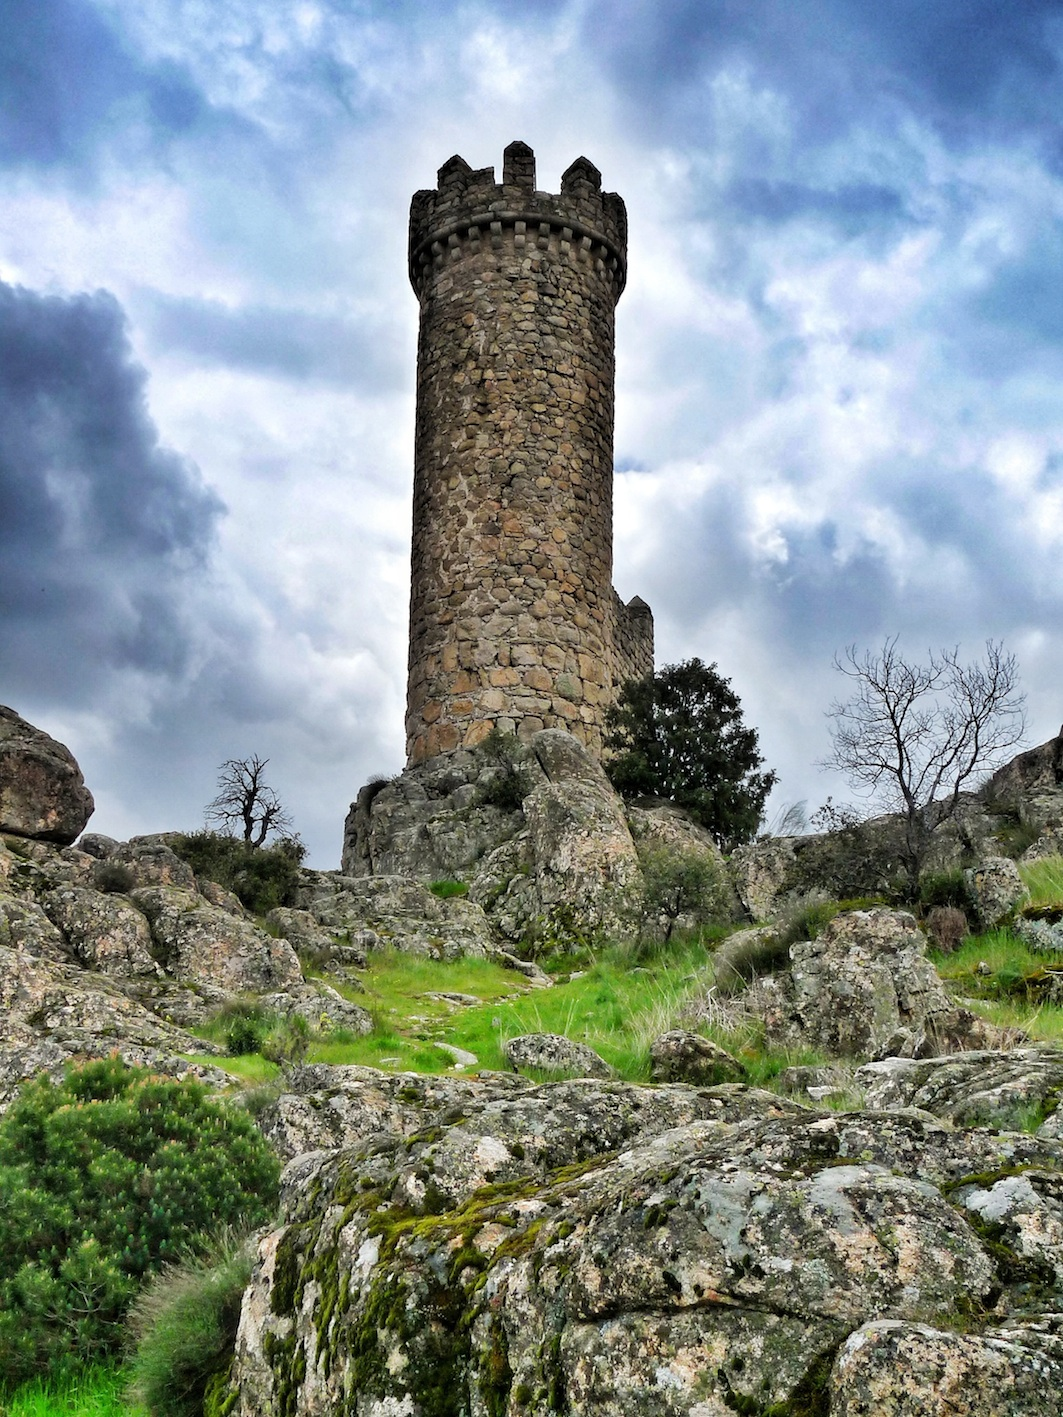 Torrelodones Siglo XVII